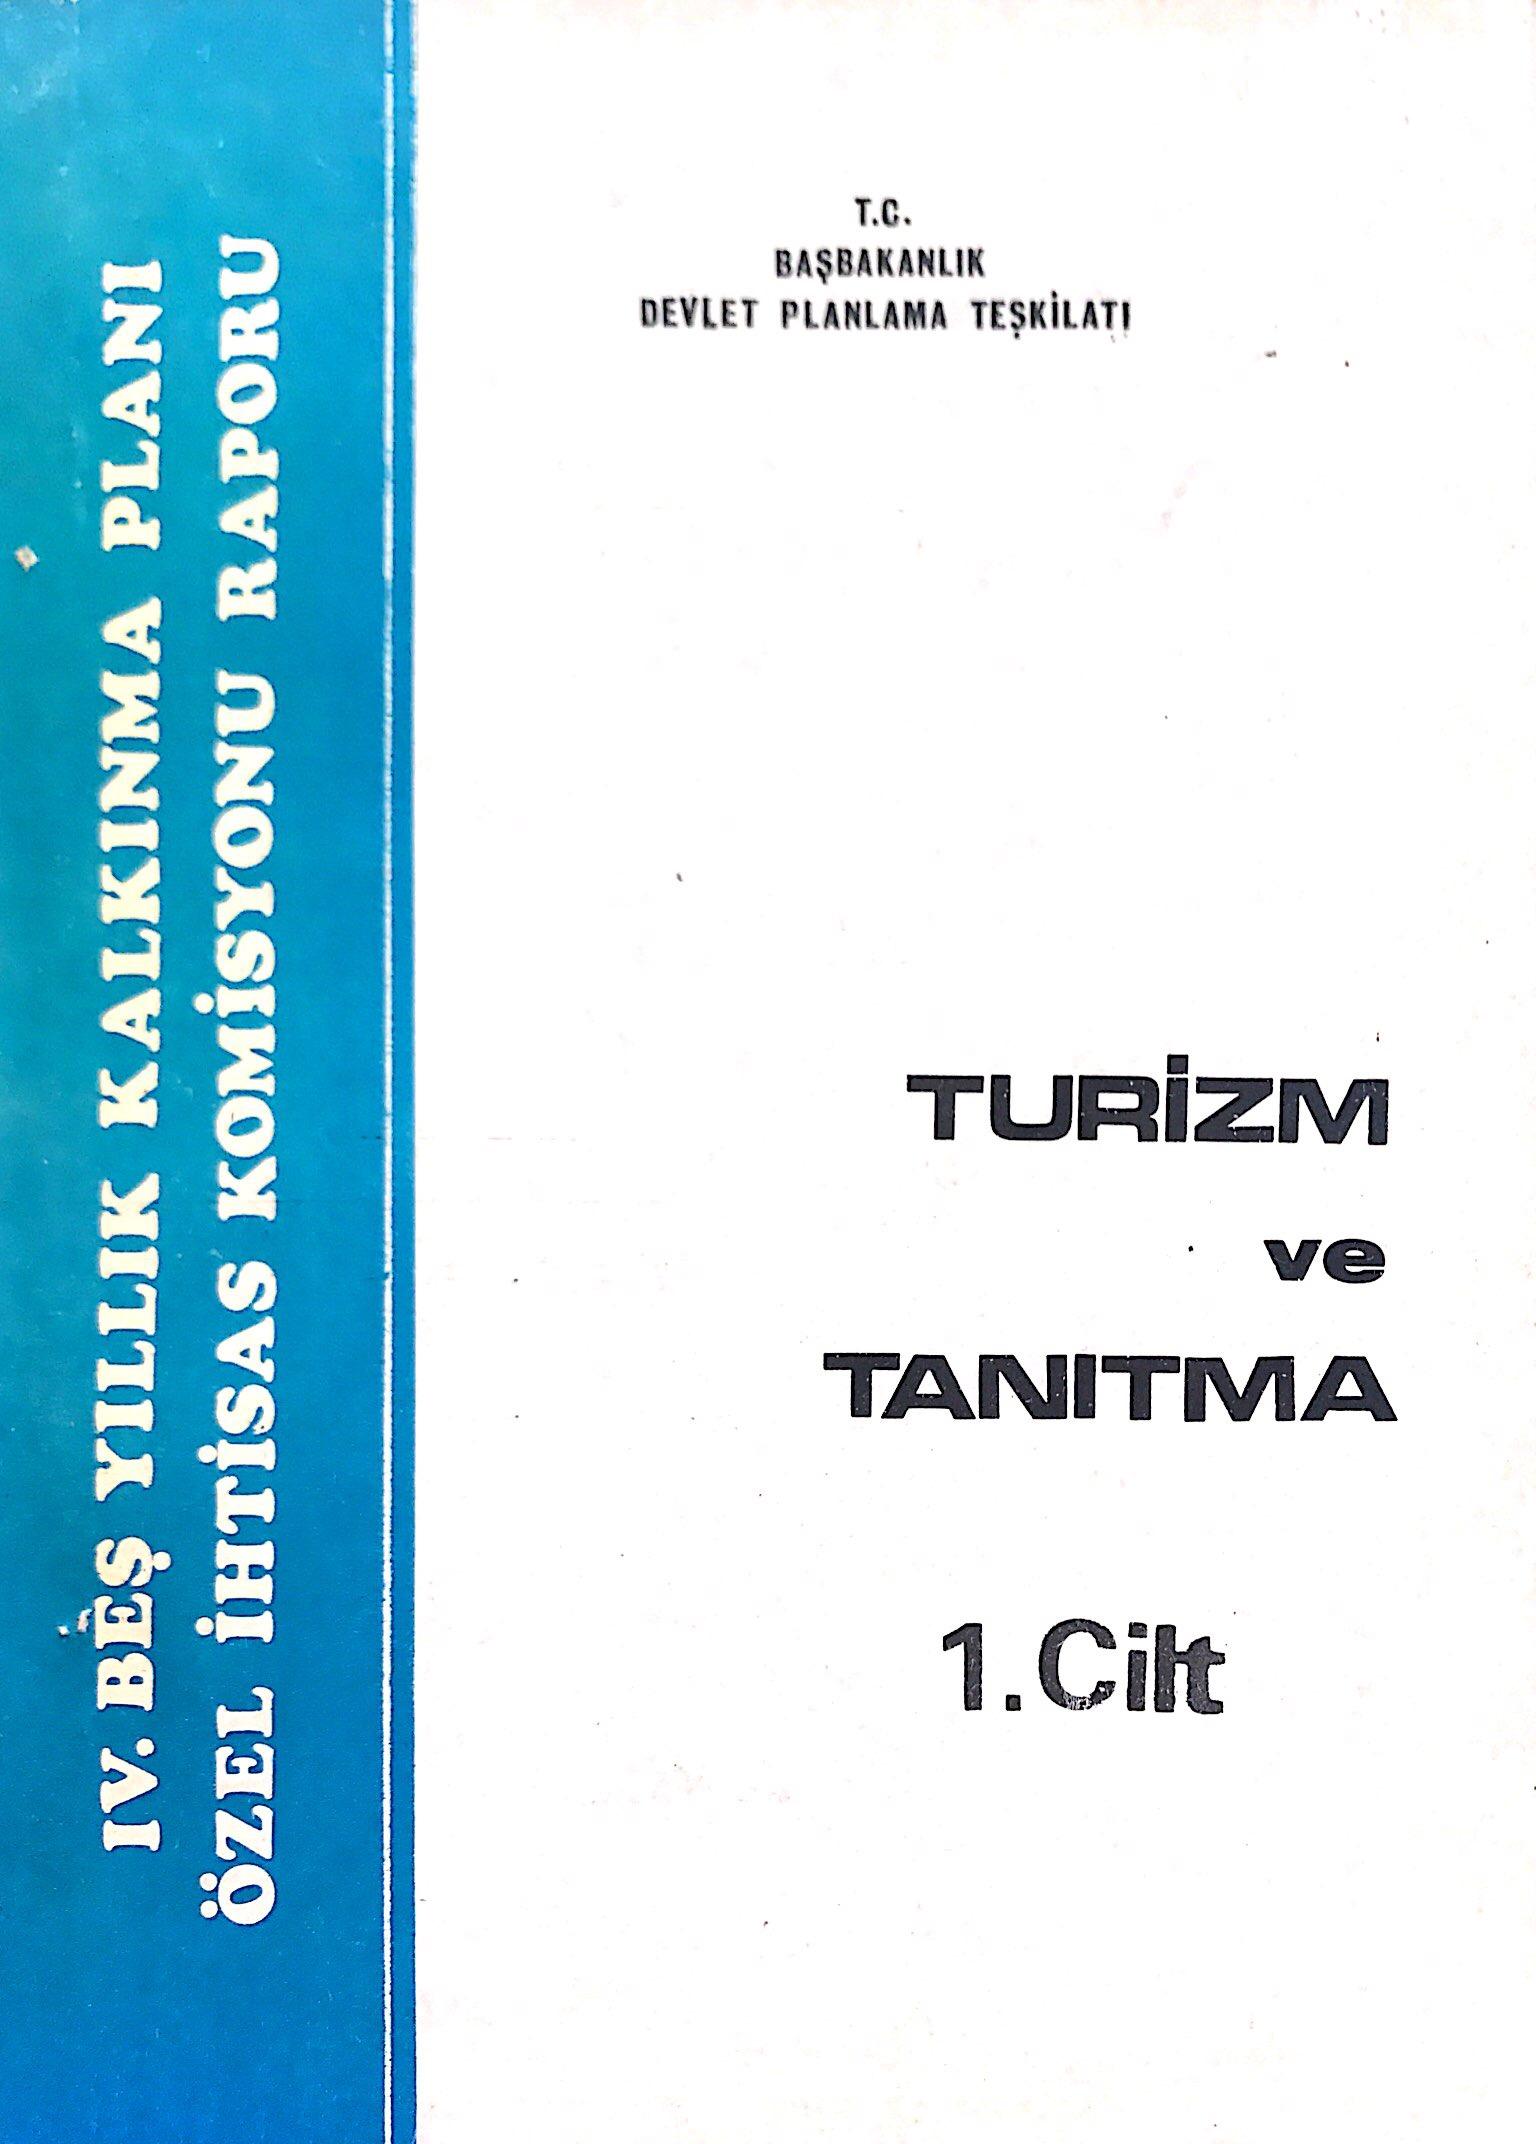 Turizm ve Tanıtma 1. Cilt Kitap Kapağı